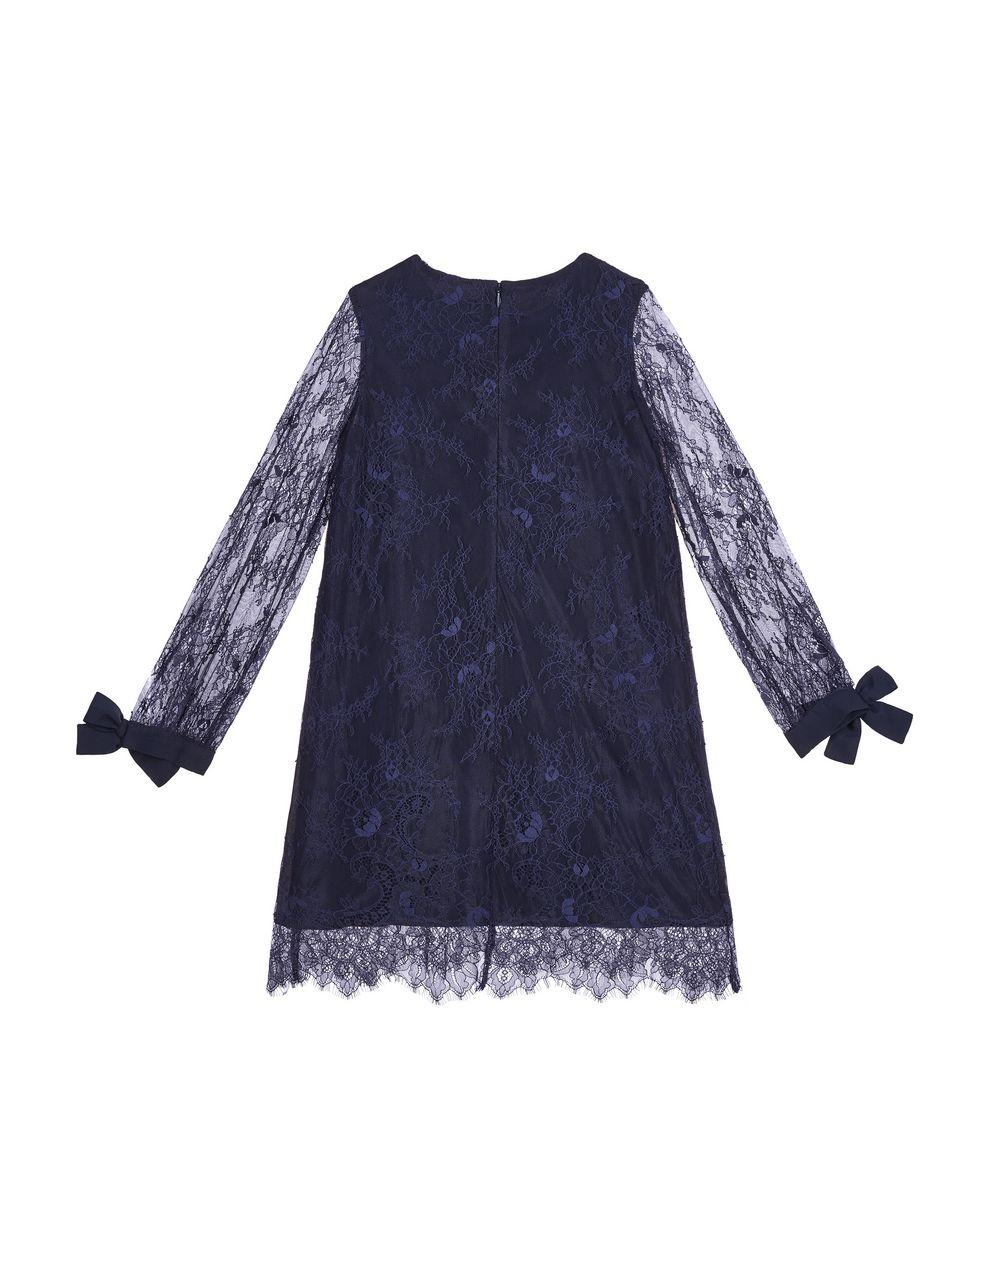 NAVY BLUE LACE DRESS - Lanvin